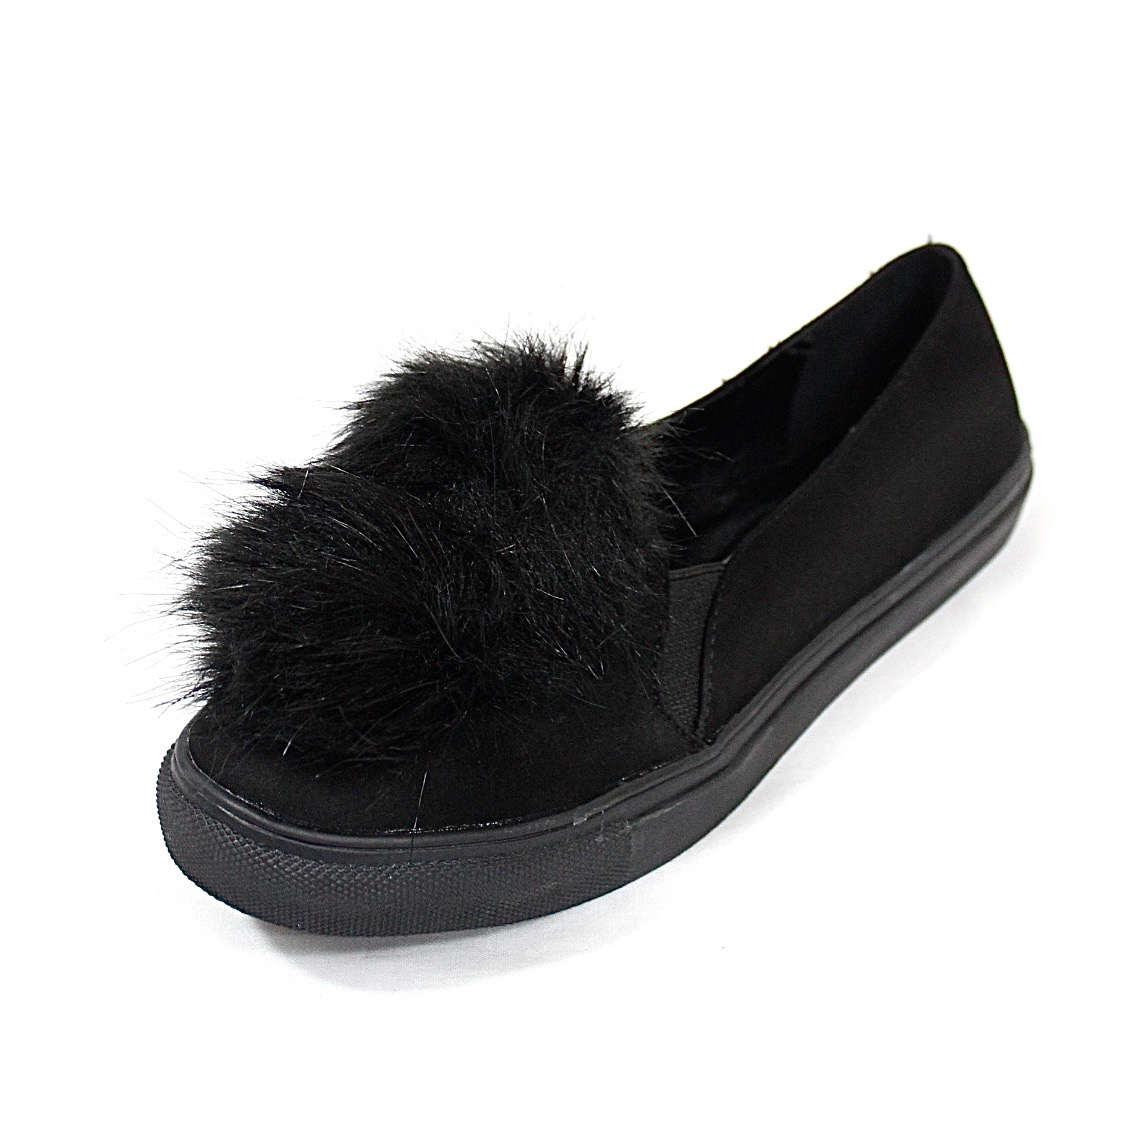 Liliana Bailey-1 Black Flat Slip On Faux Fur Ball Pom Pom Round Toe Sneakers-4356